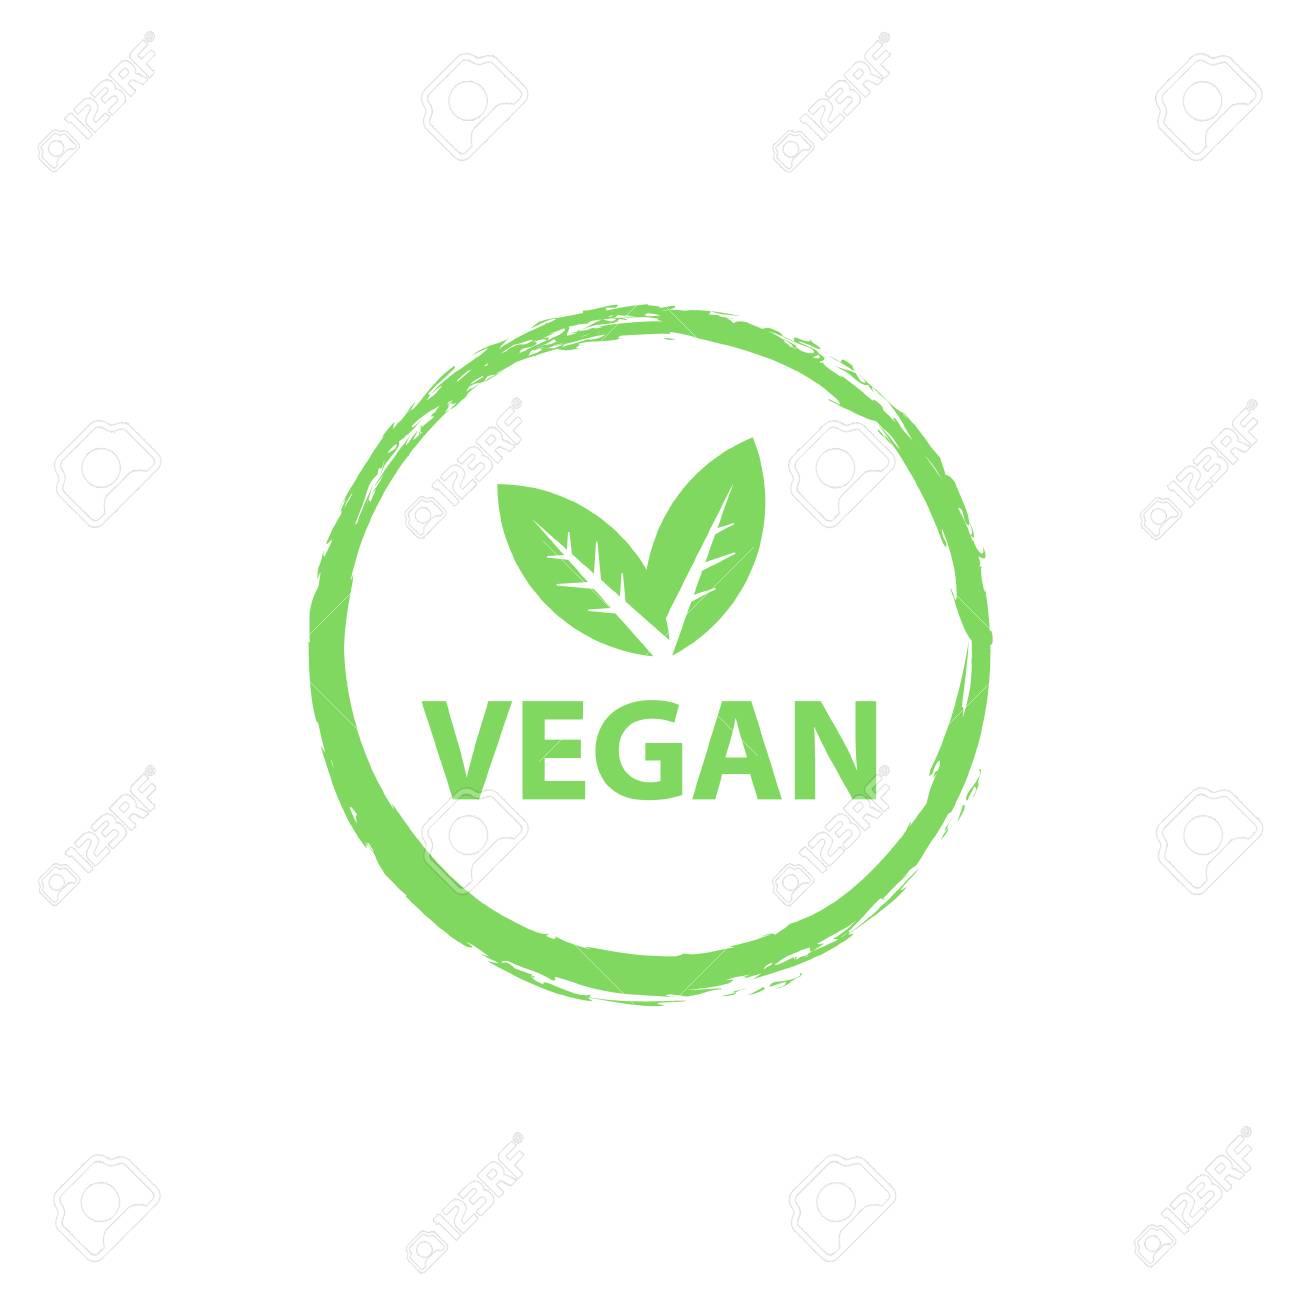 Vegan icon, organic bio icon or sign  Raw, healthy food badges,